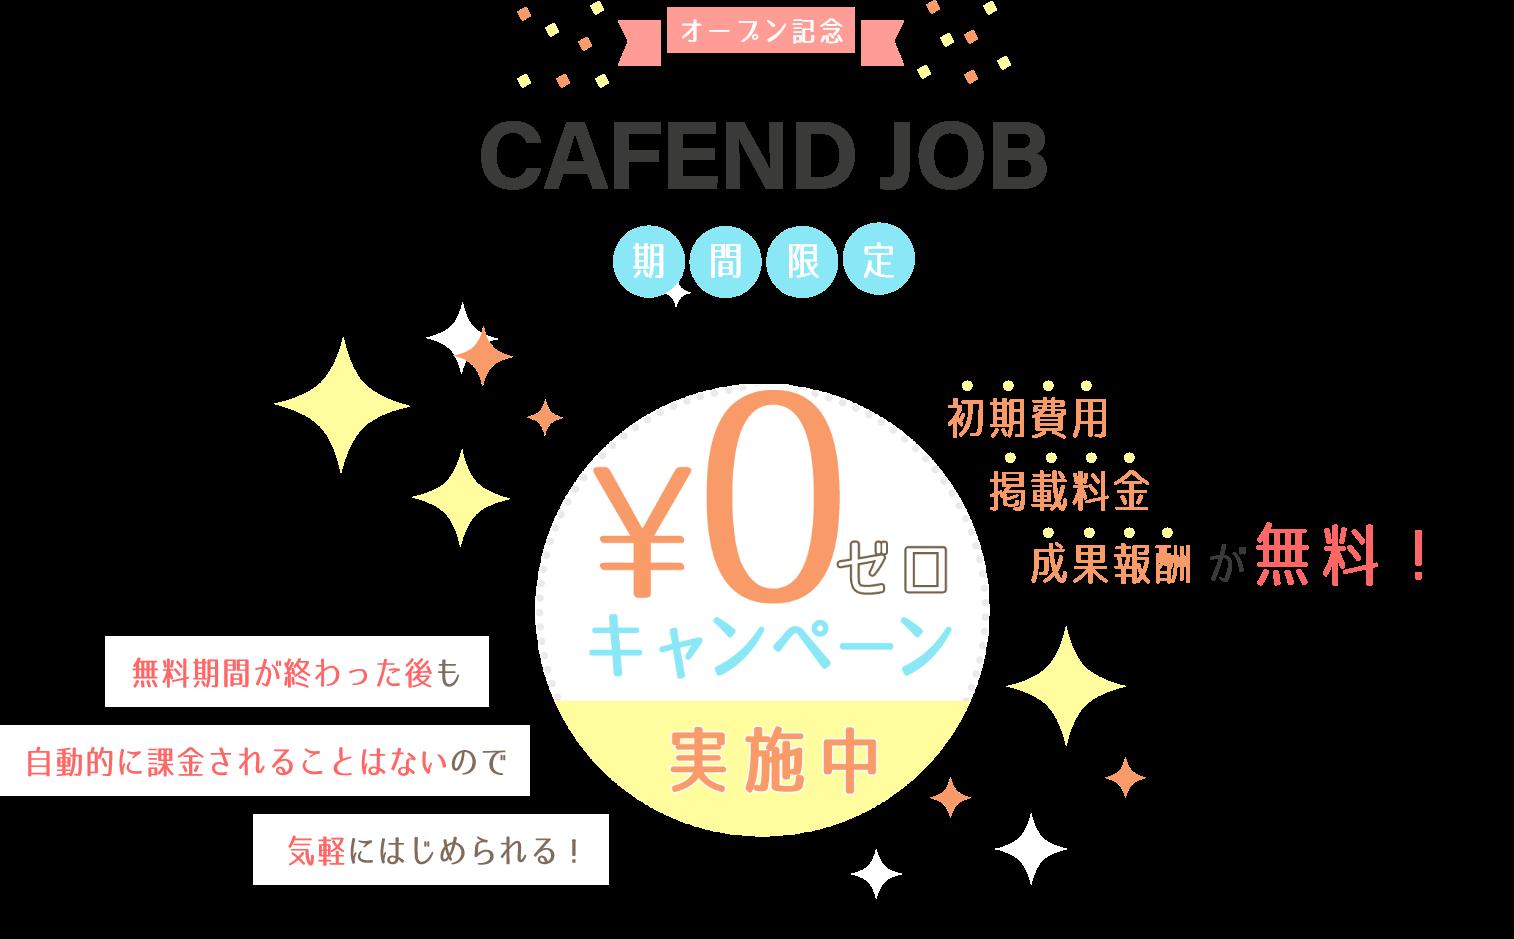 CAFEND JOB オープン記念 期間限定0円キャンペーン実施中